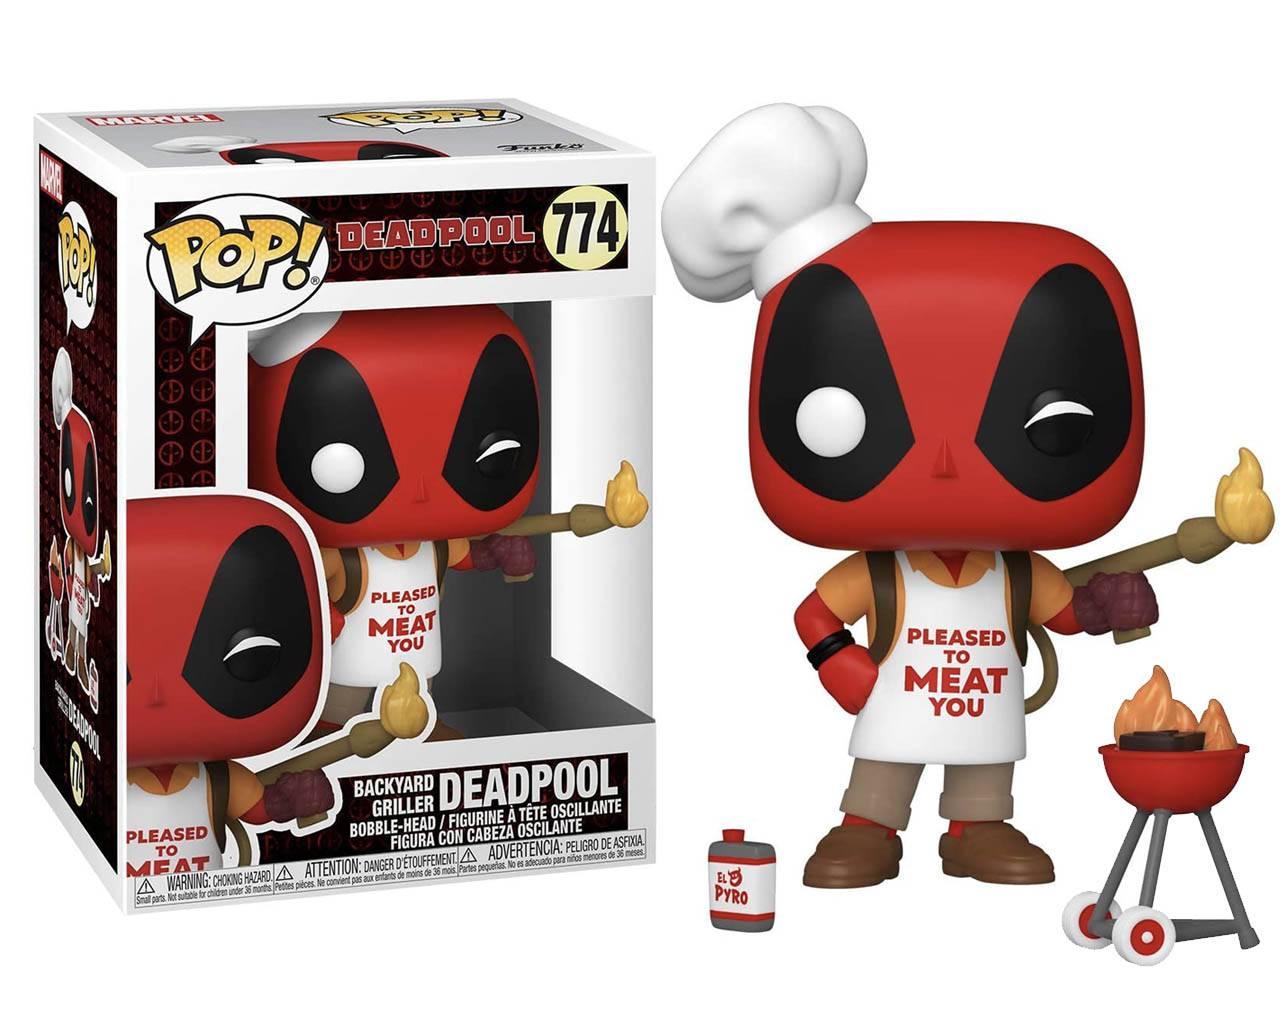 Backyard Griller Deadpool (30th Anniversary) Pop! Vinyl